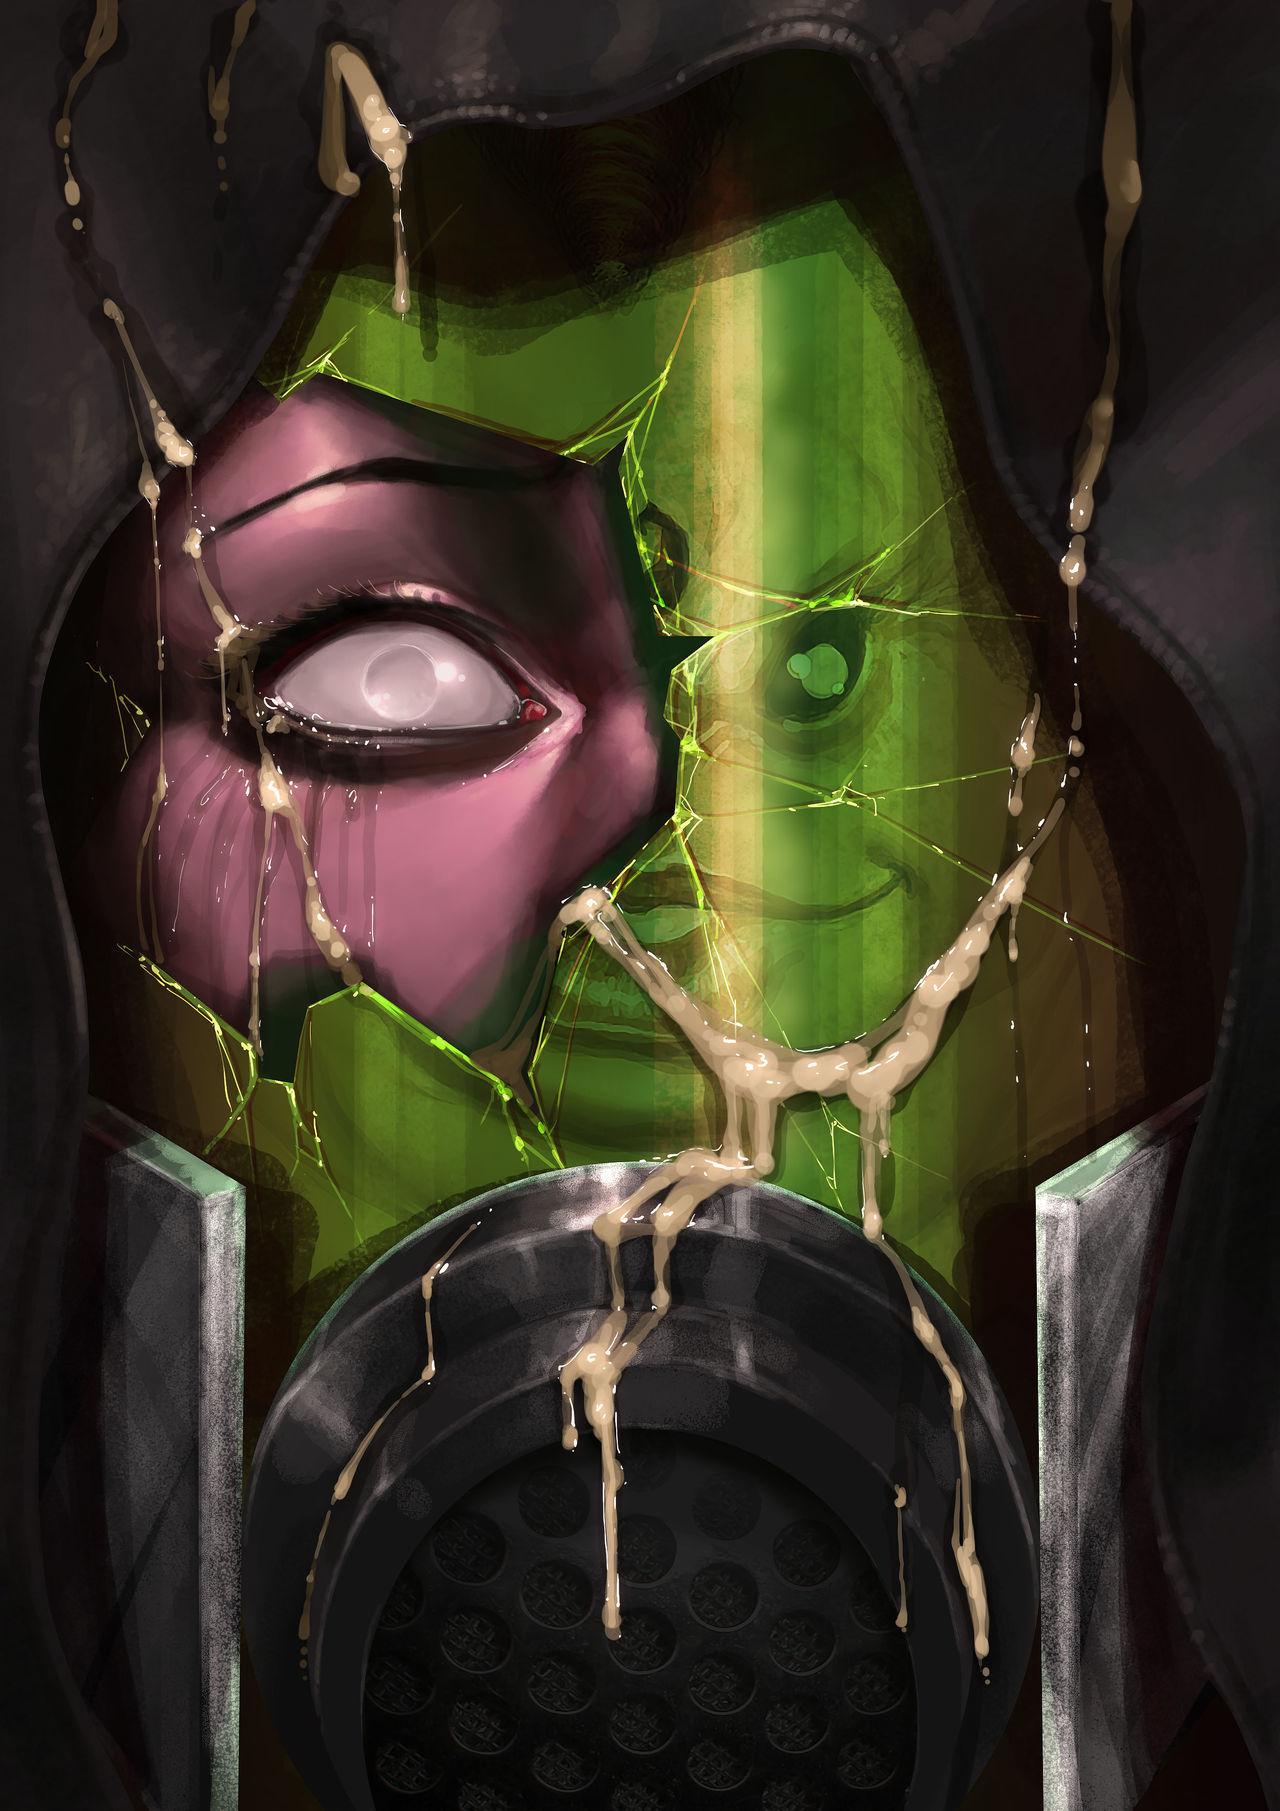 The_Quarian_Set_-_Studio-Pirrate_[Mass_Effect] comix_57805.jpg